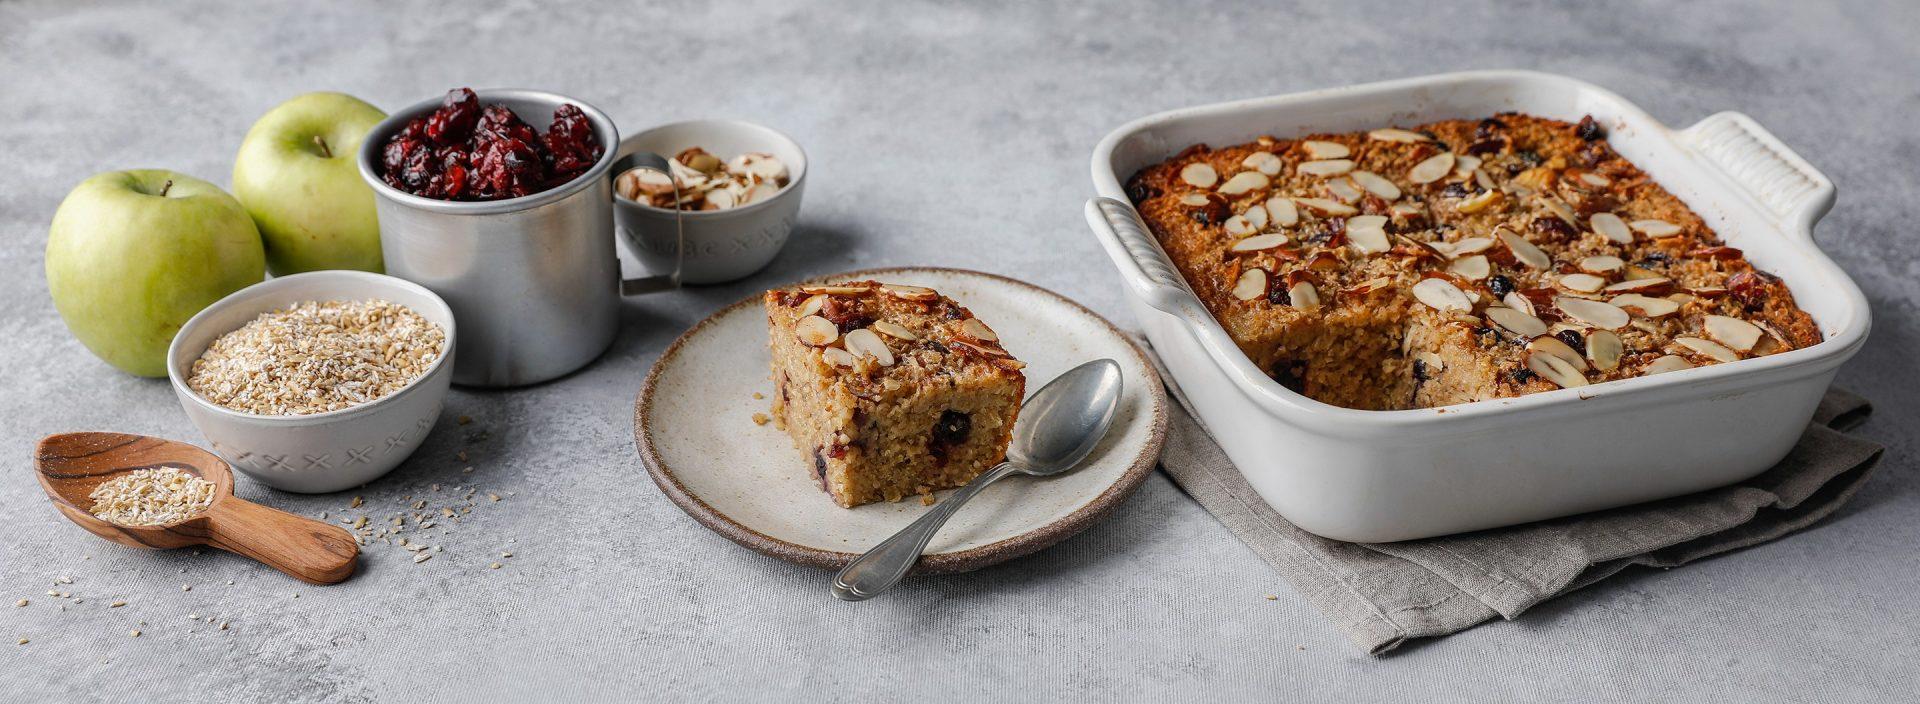 Overnight baked Oatmeal 2020 Winter